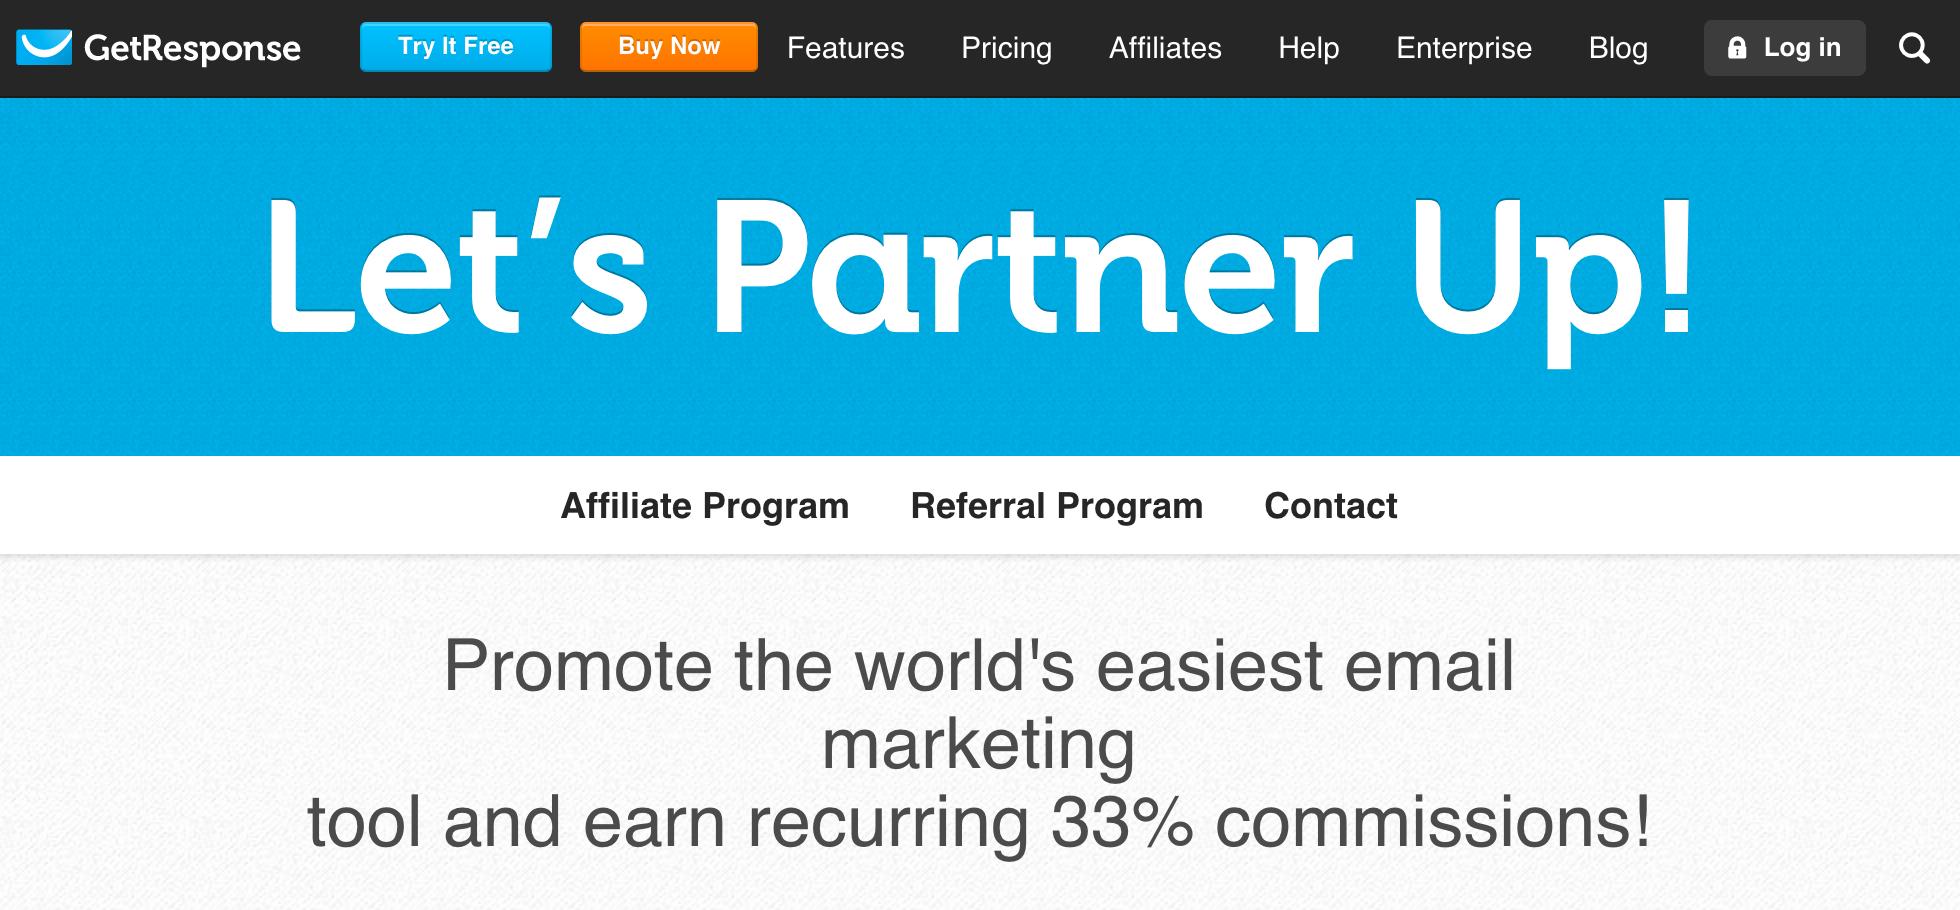 GetResponse - Email Marketing Affiliate Program